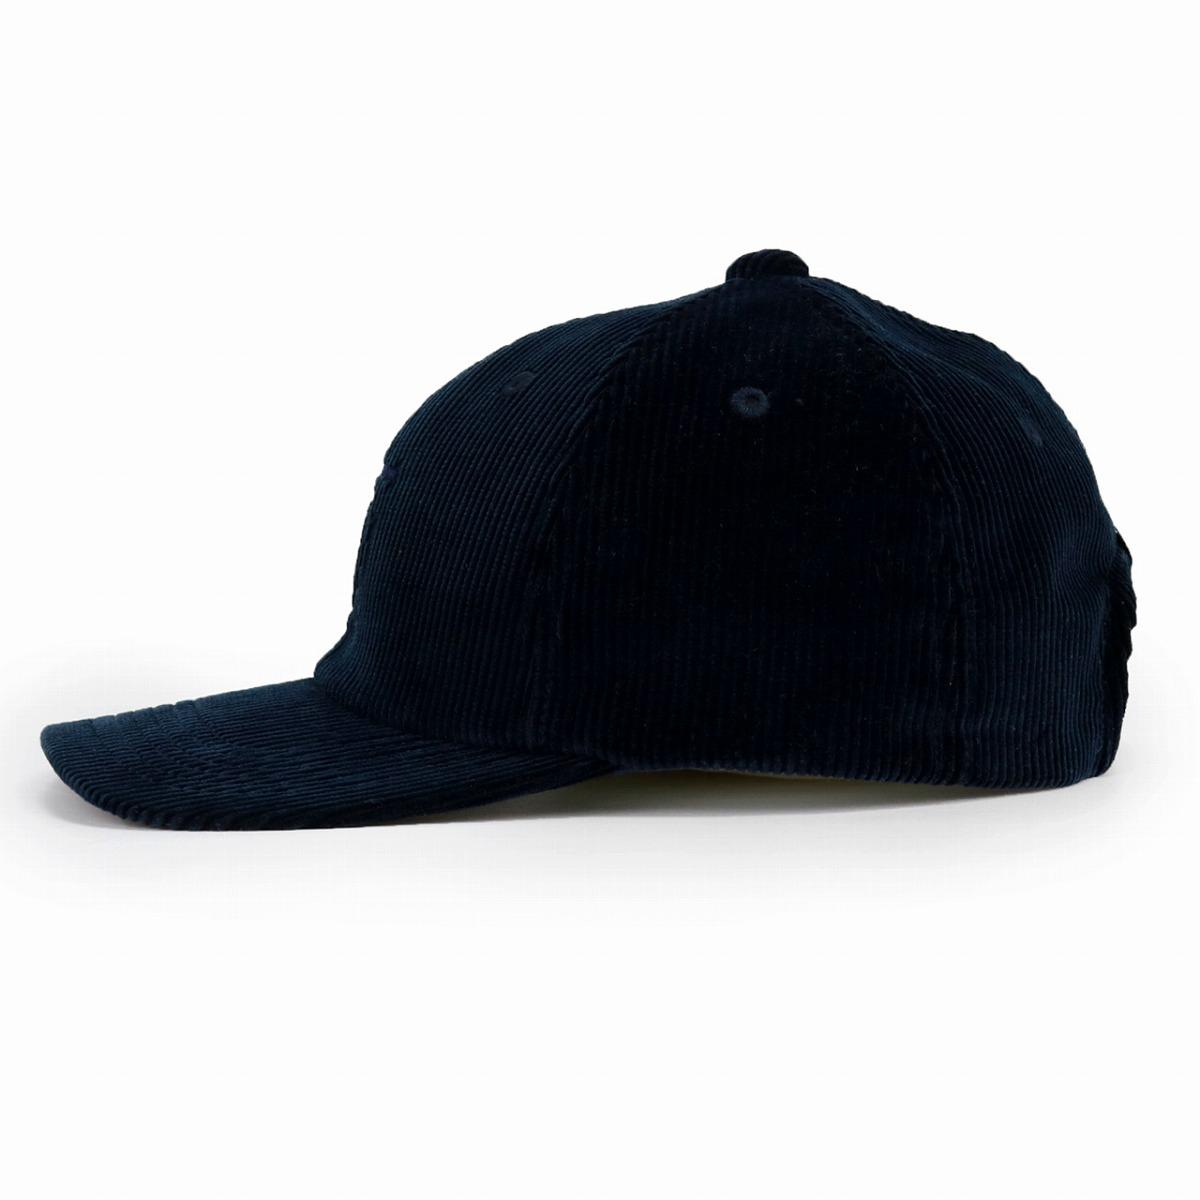 ef40f0145c3 ELEHELM HAT STORE  Men corduroy cap Lady s dark blue navy  baseball ...